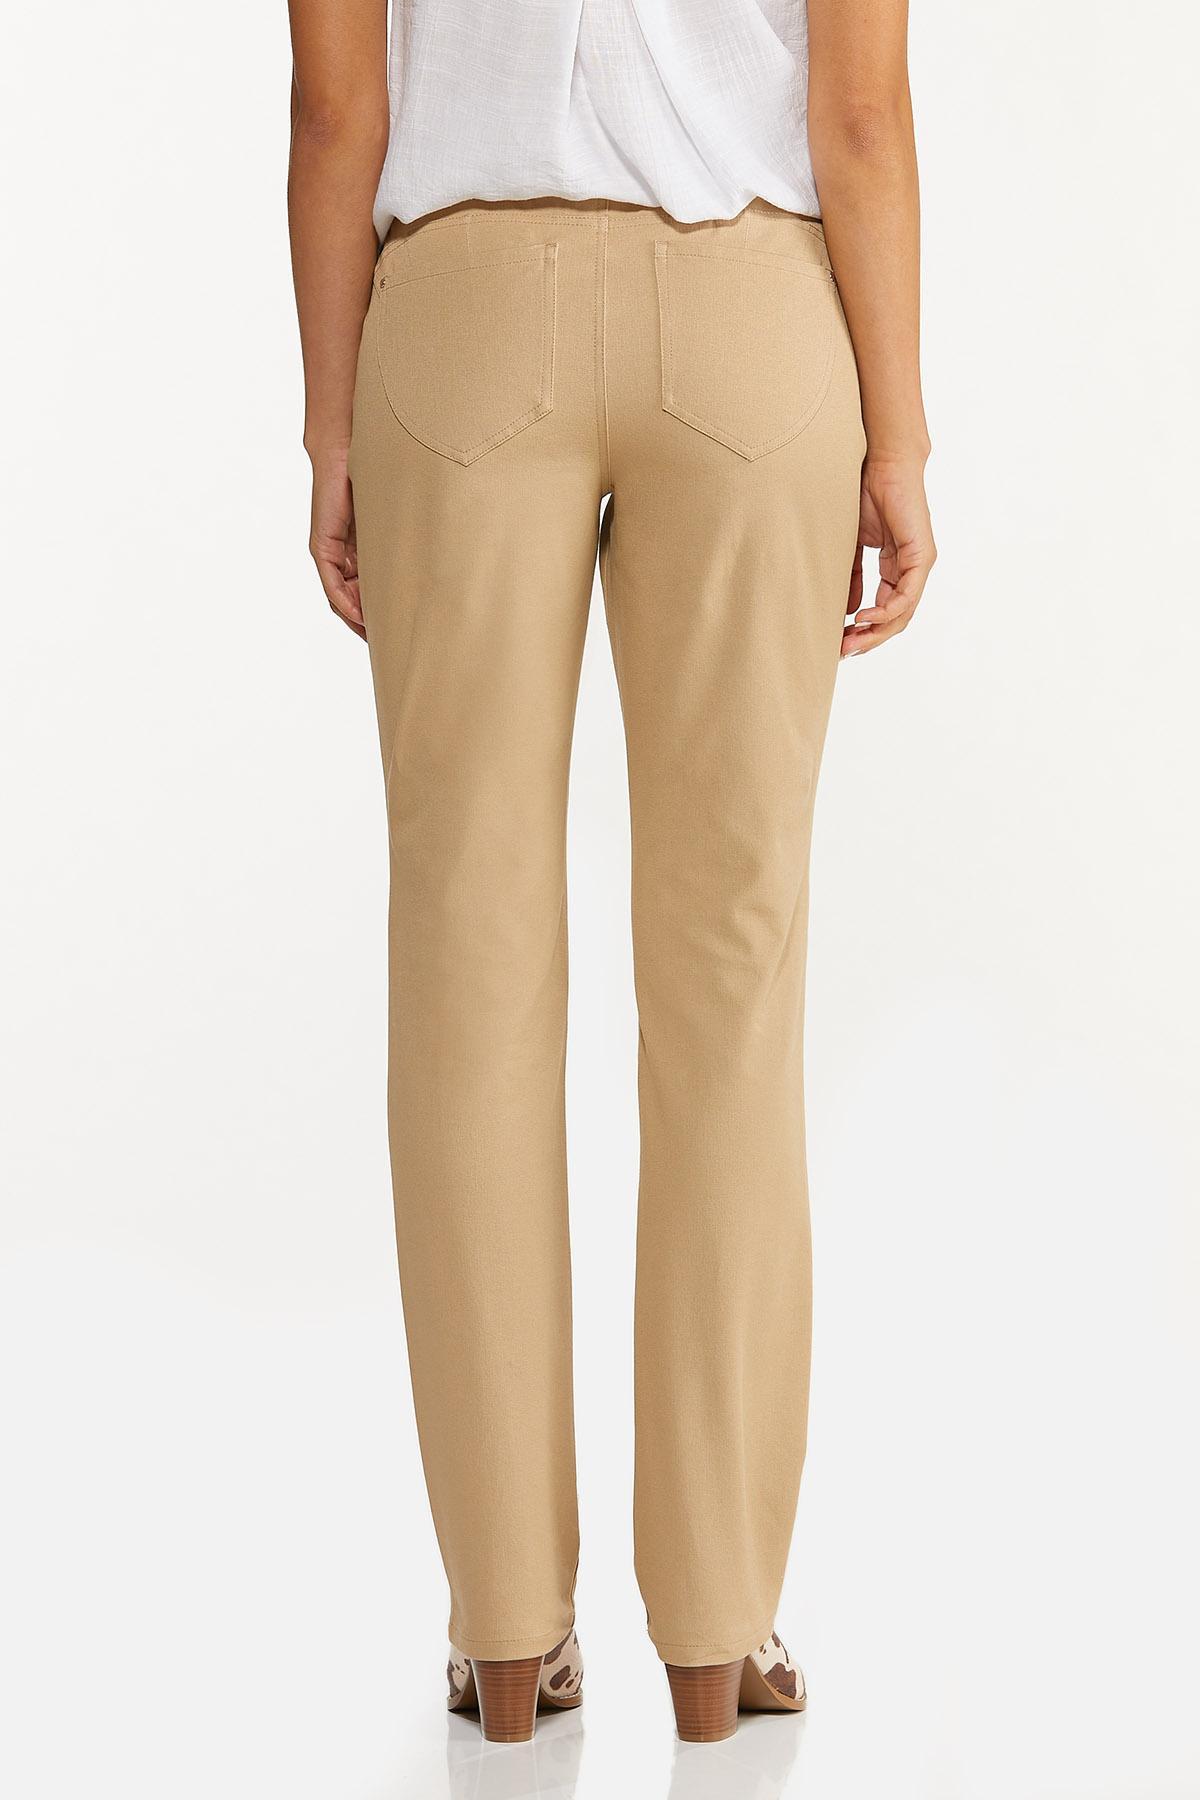 Curvy Getaway Pants (Item #44657774)